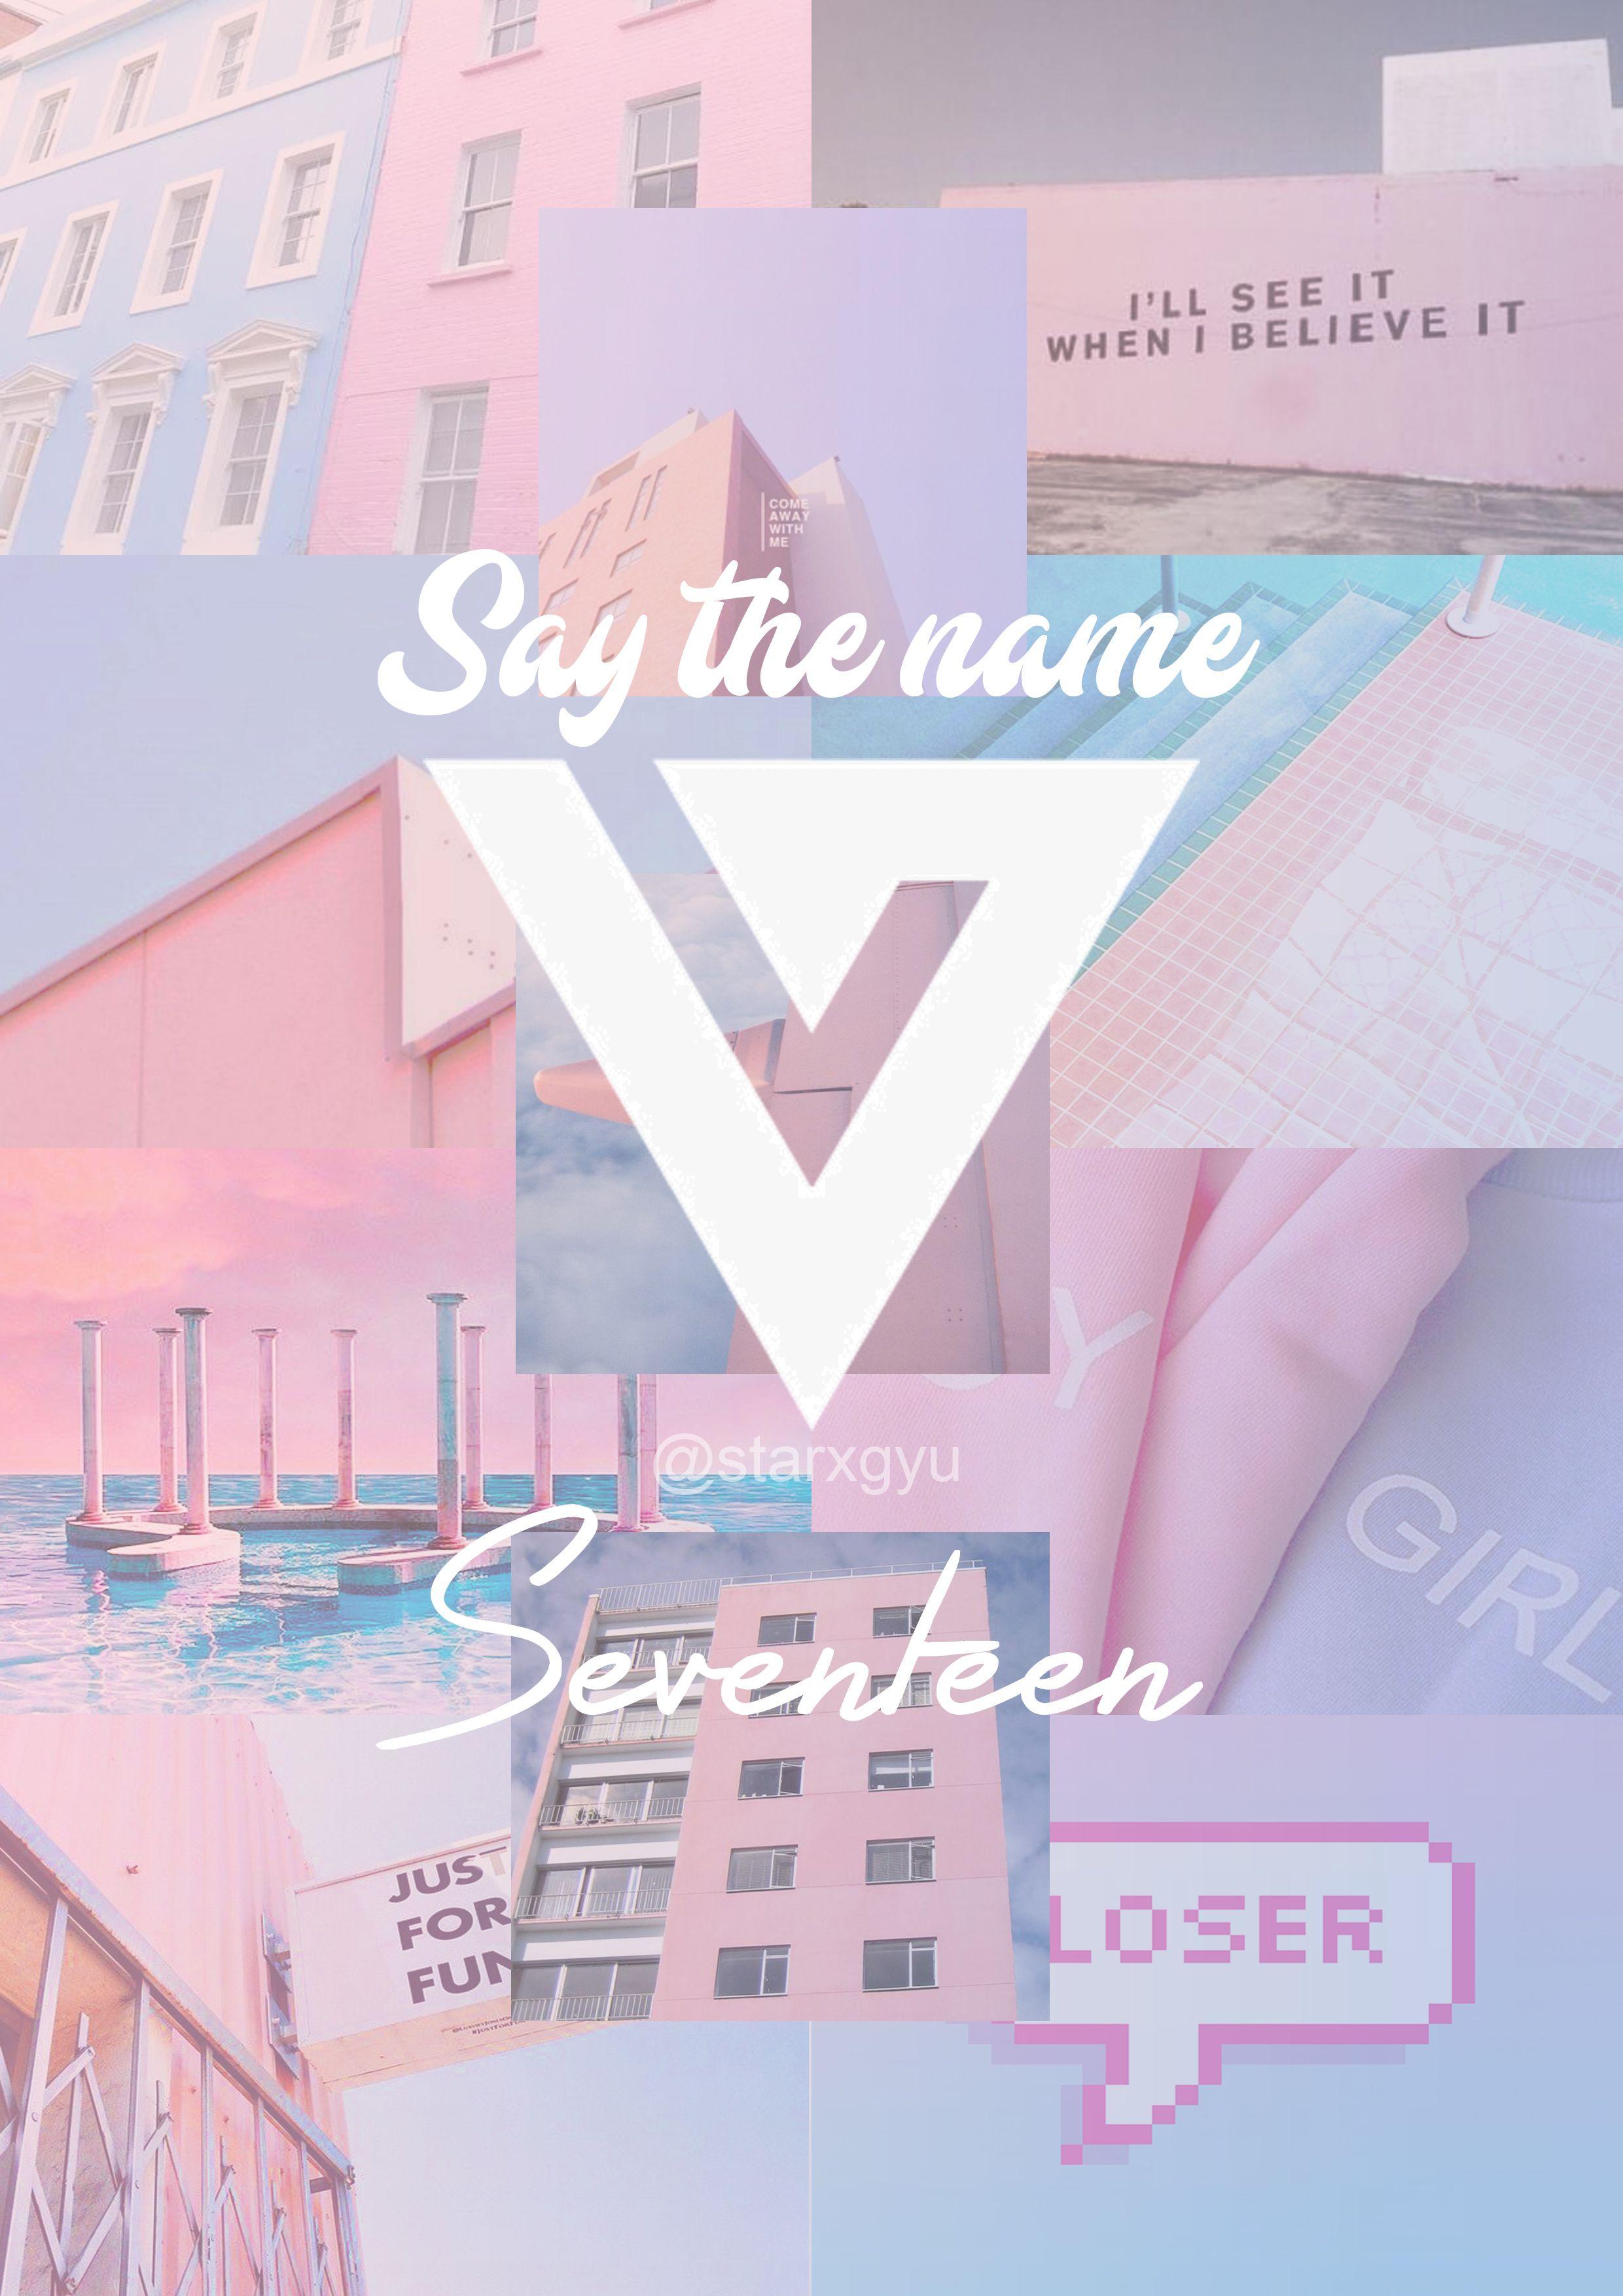 Seventeen Seventeen Seventeen Album Seventeen Wallpapers Aesthetic seventeen kpop wallpaper hd